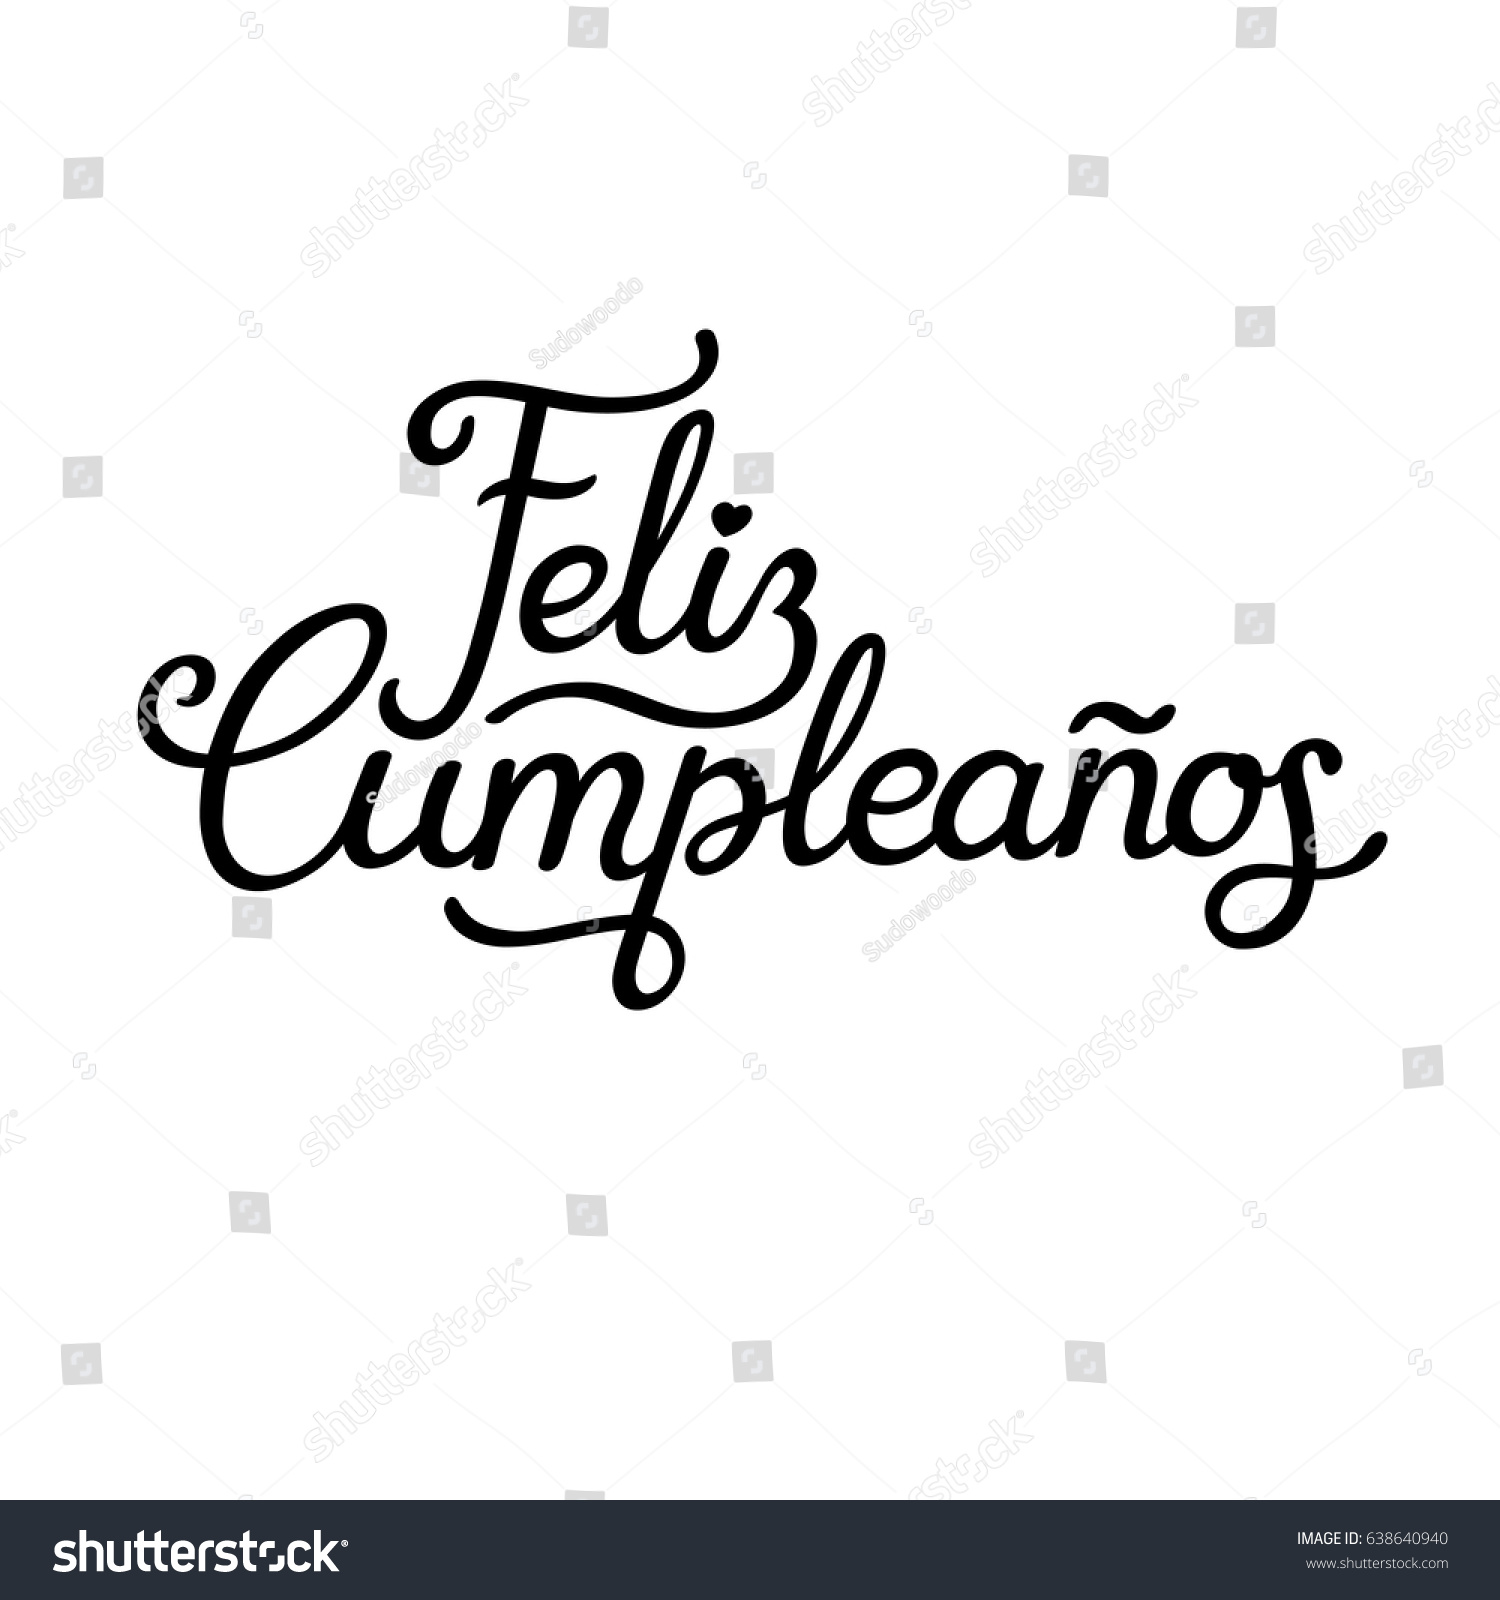 Feliz cumpleanos translated happy birthday spanish stock - Feliz cumpleanos letras ...